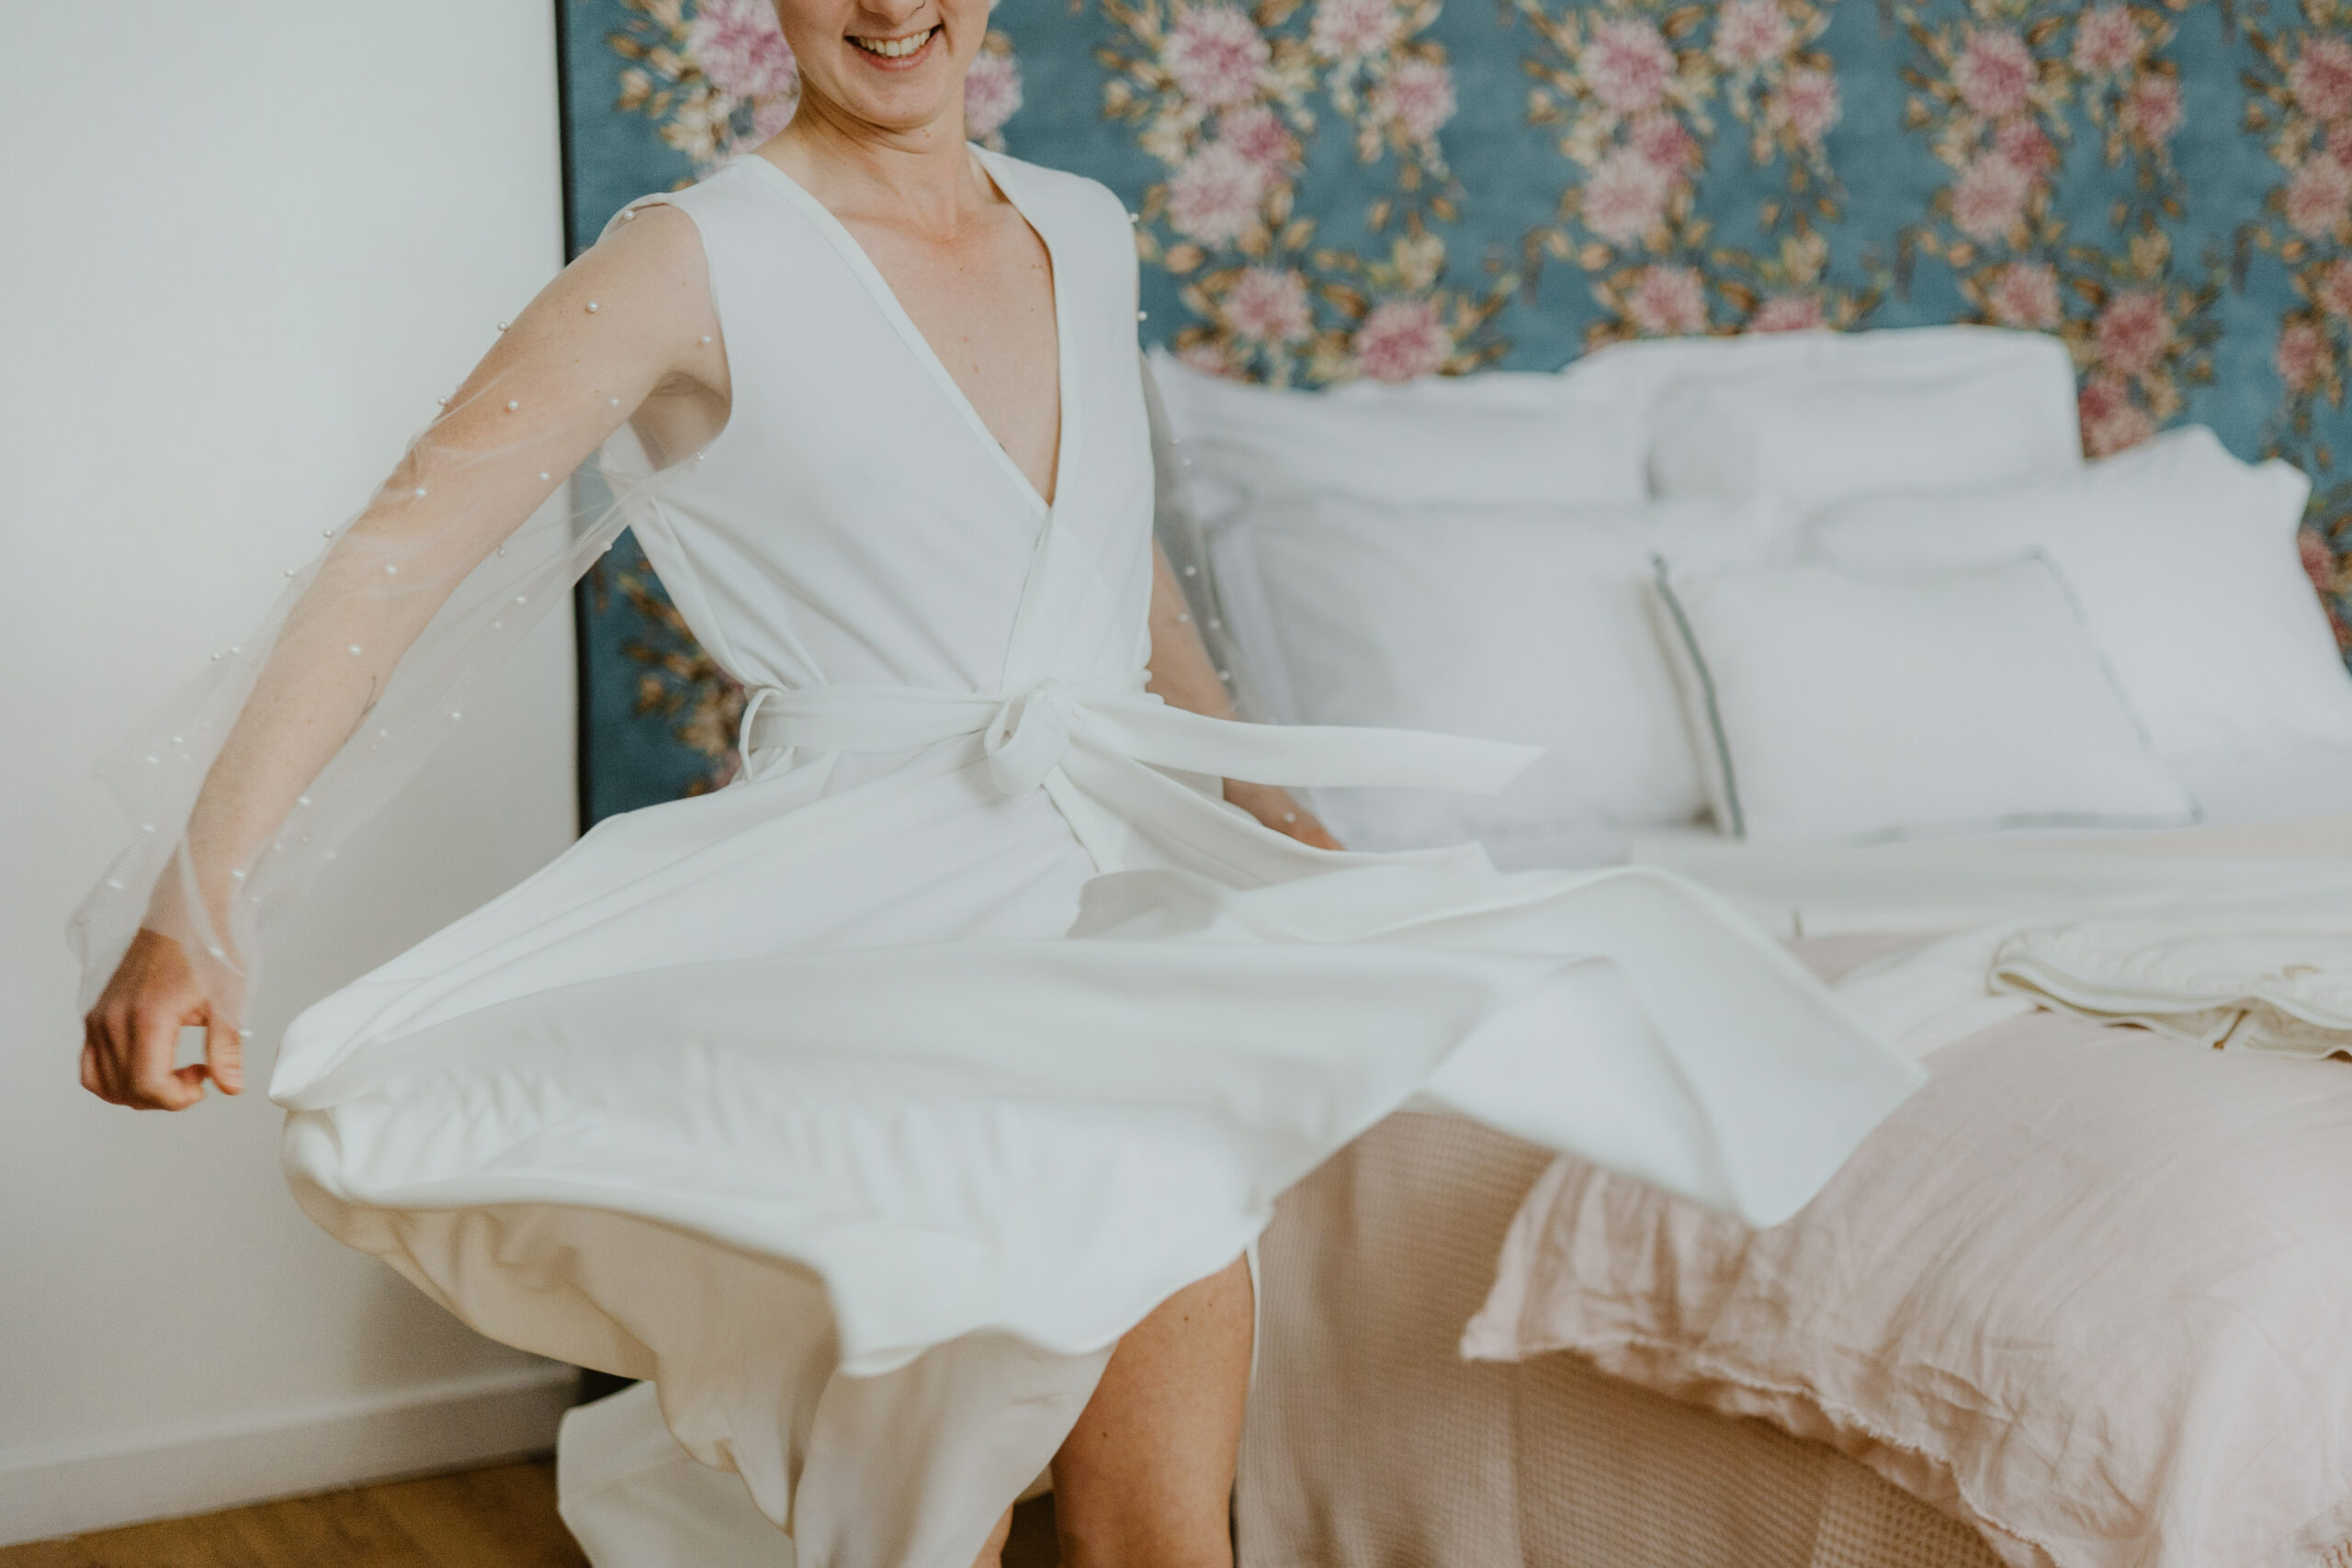 Kimono Saana mariage Elise Martimort shooting robes de mariee civiles Jade Sequeval